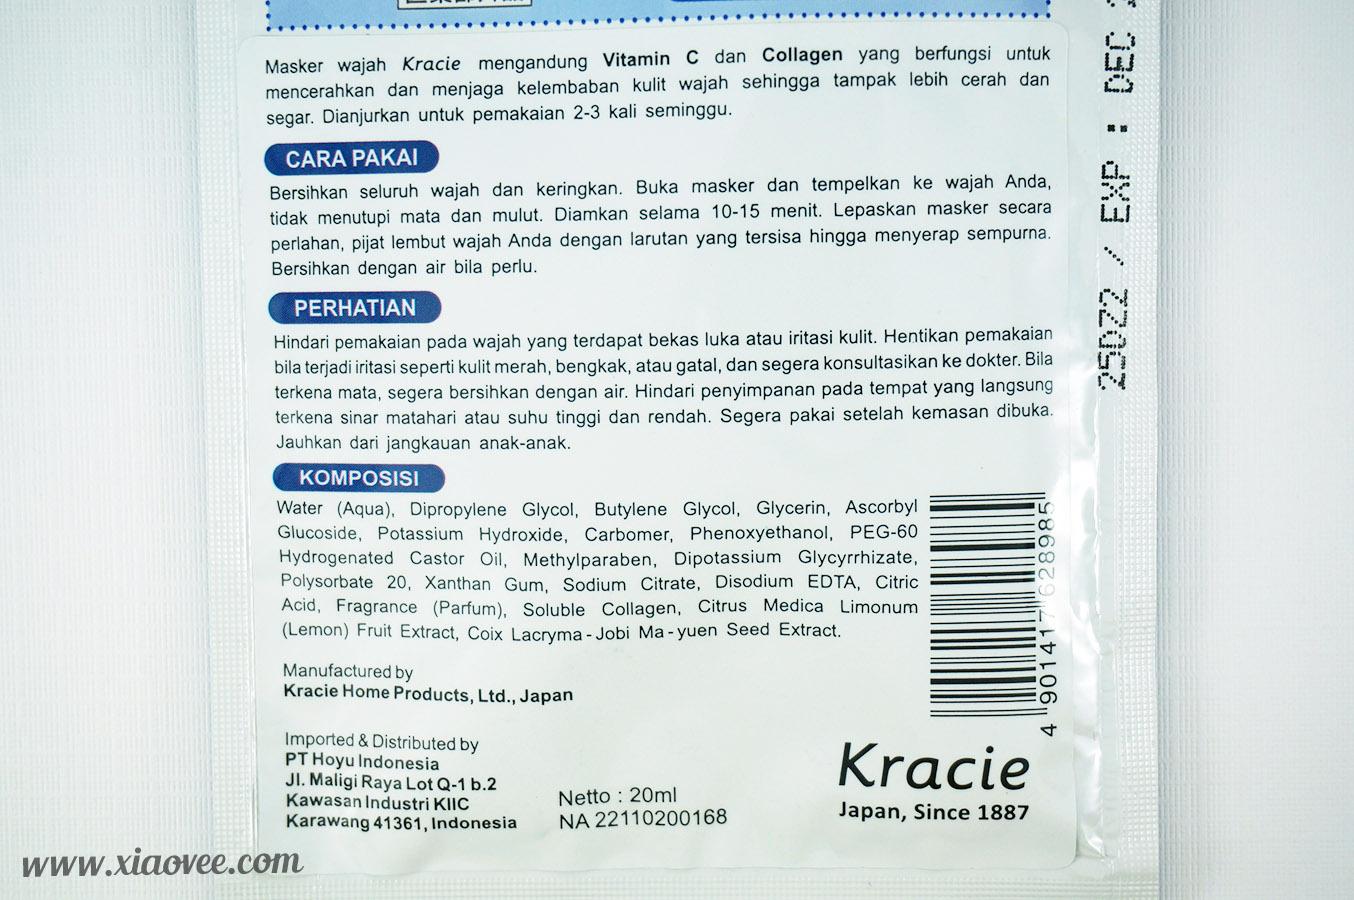 Kracie Hadabisei, Kracie Hadabisei Facial Mask, Kracie Hadabisei Sheet Mask Blue Brightening